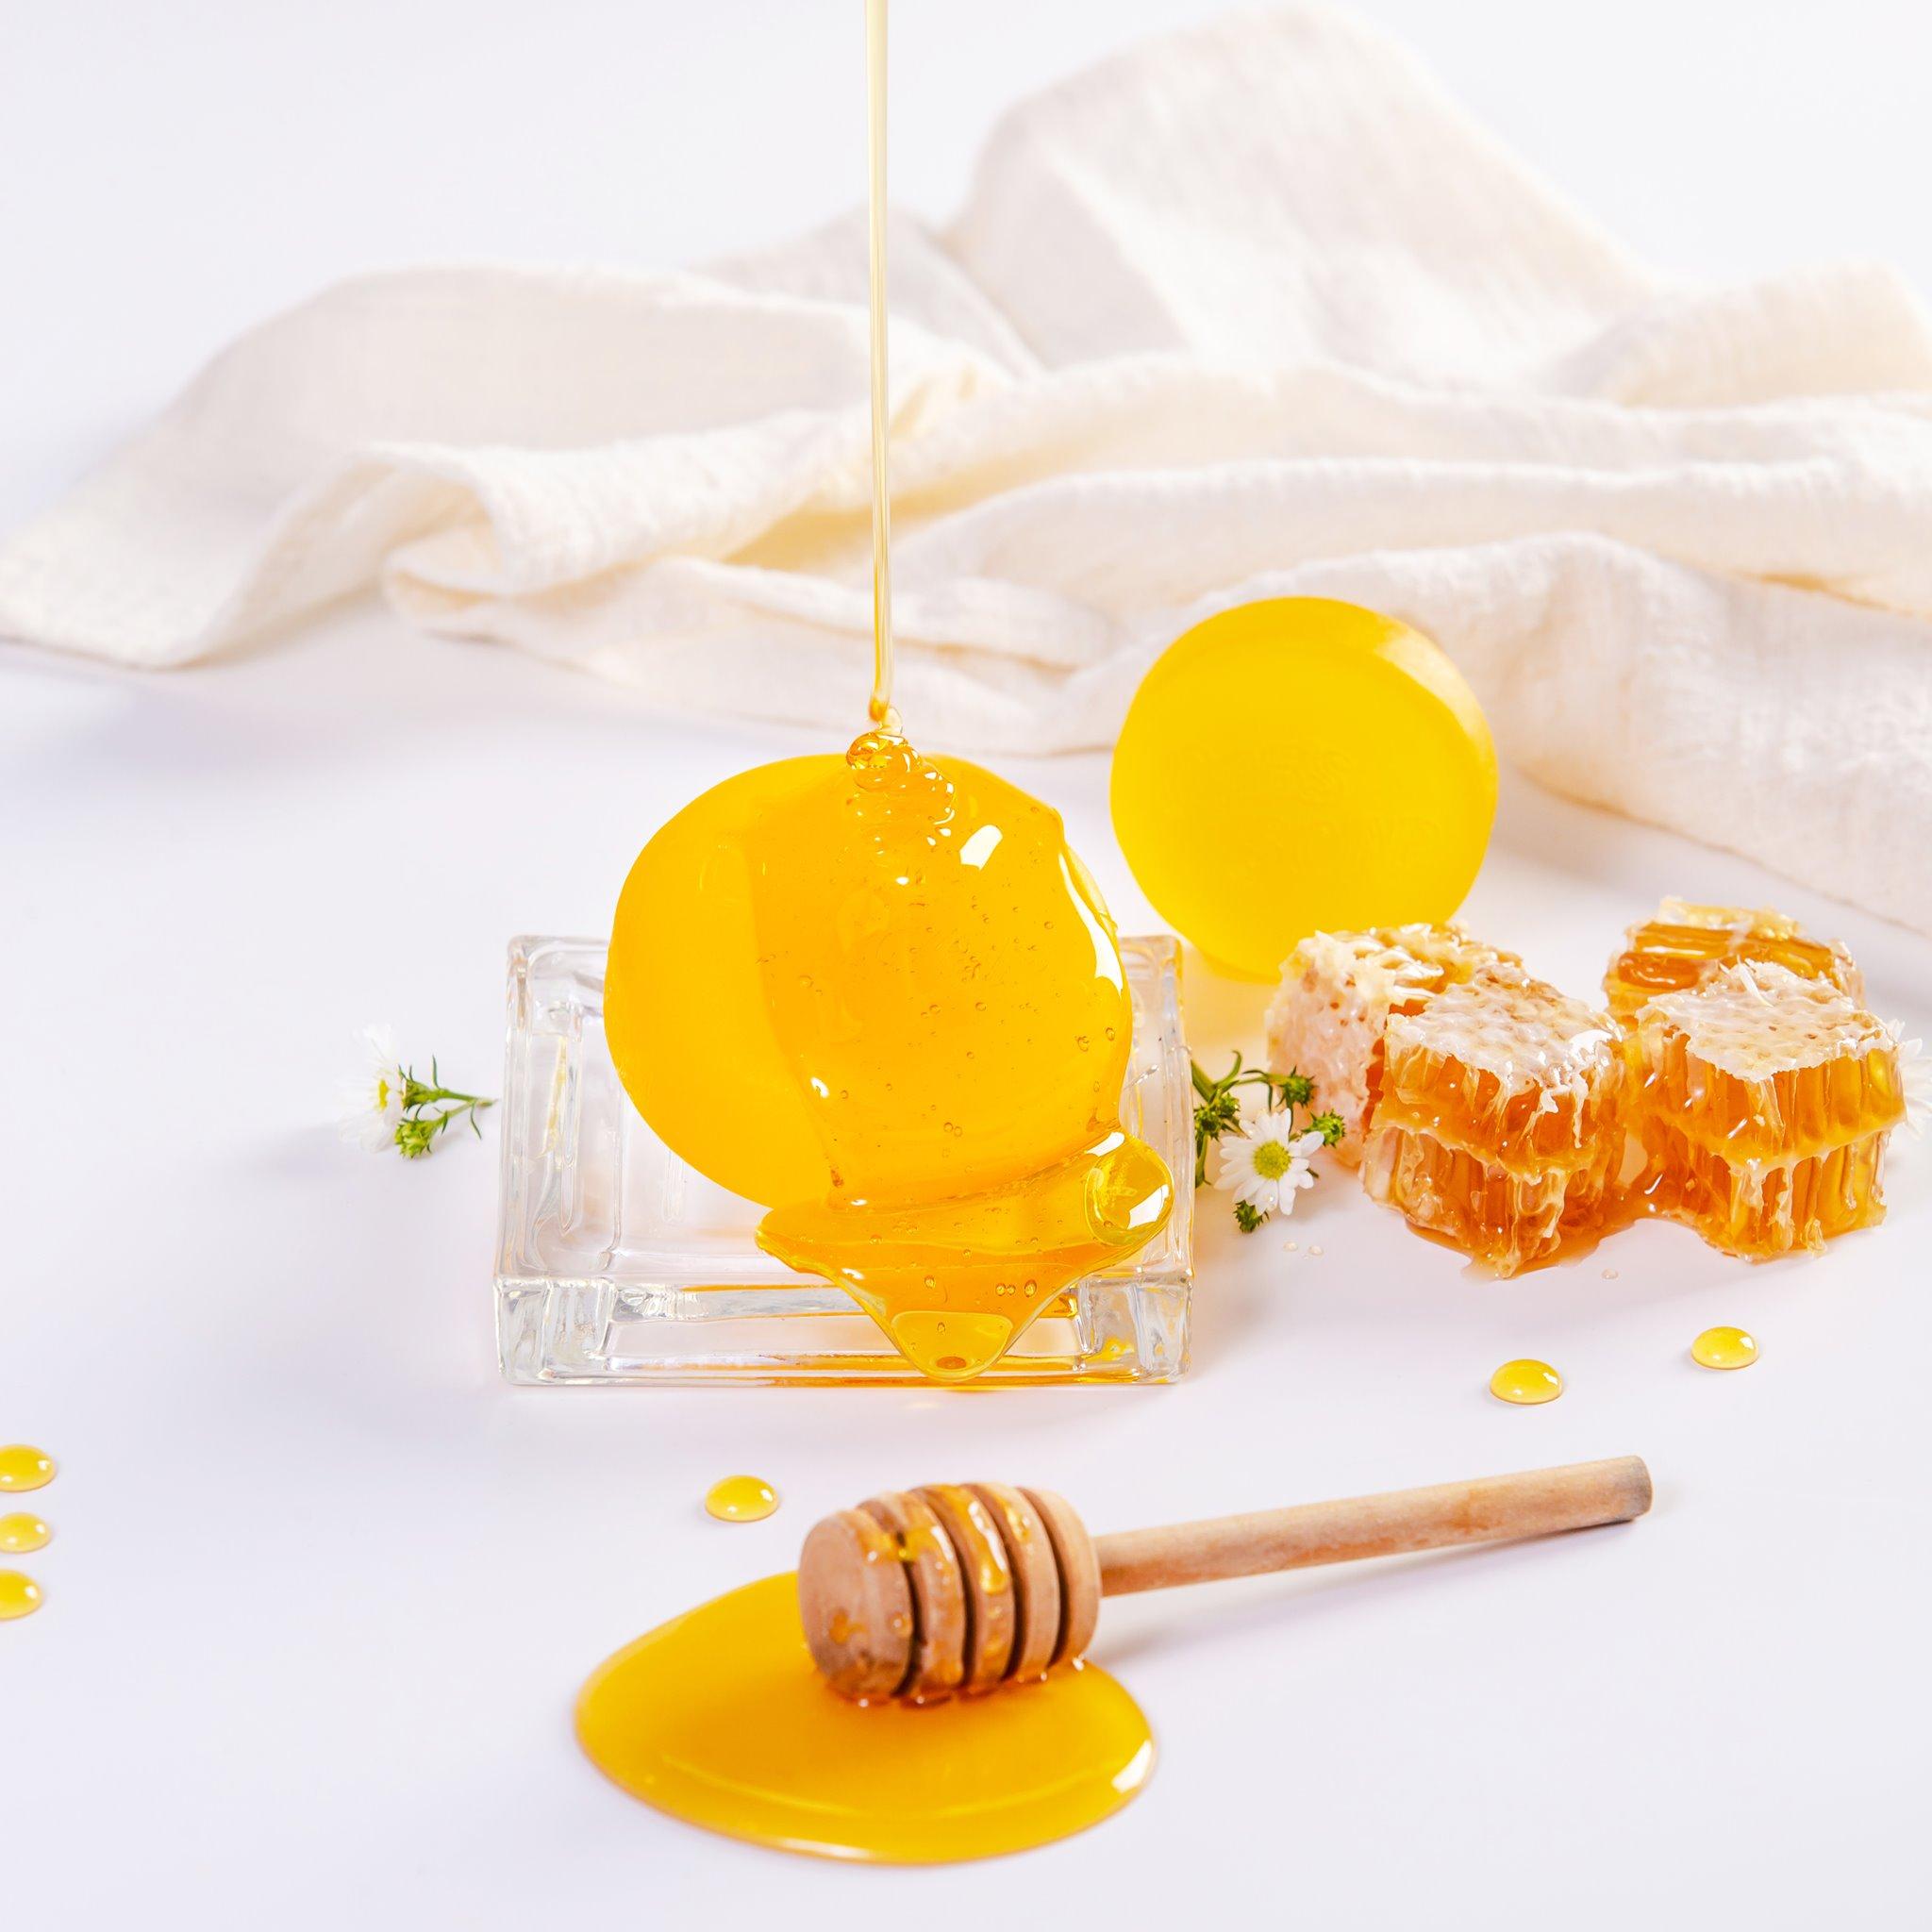 Oab's Moonlight Honey Drop น้ำผึ้งคุณภาพจาก 3 ประเทศ